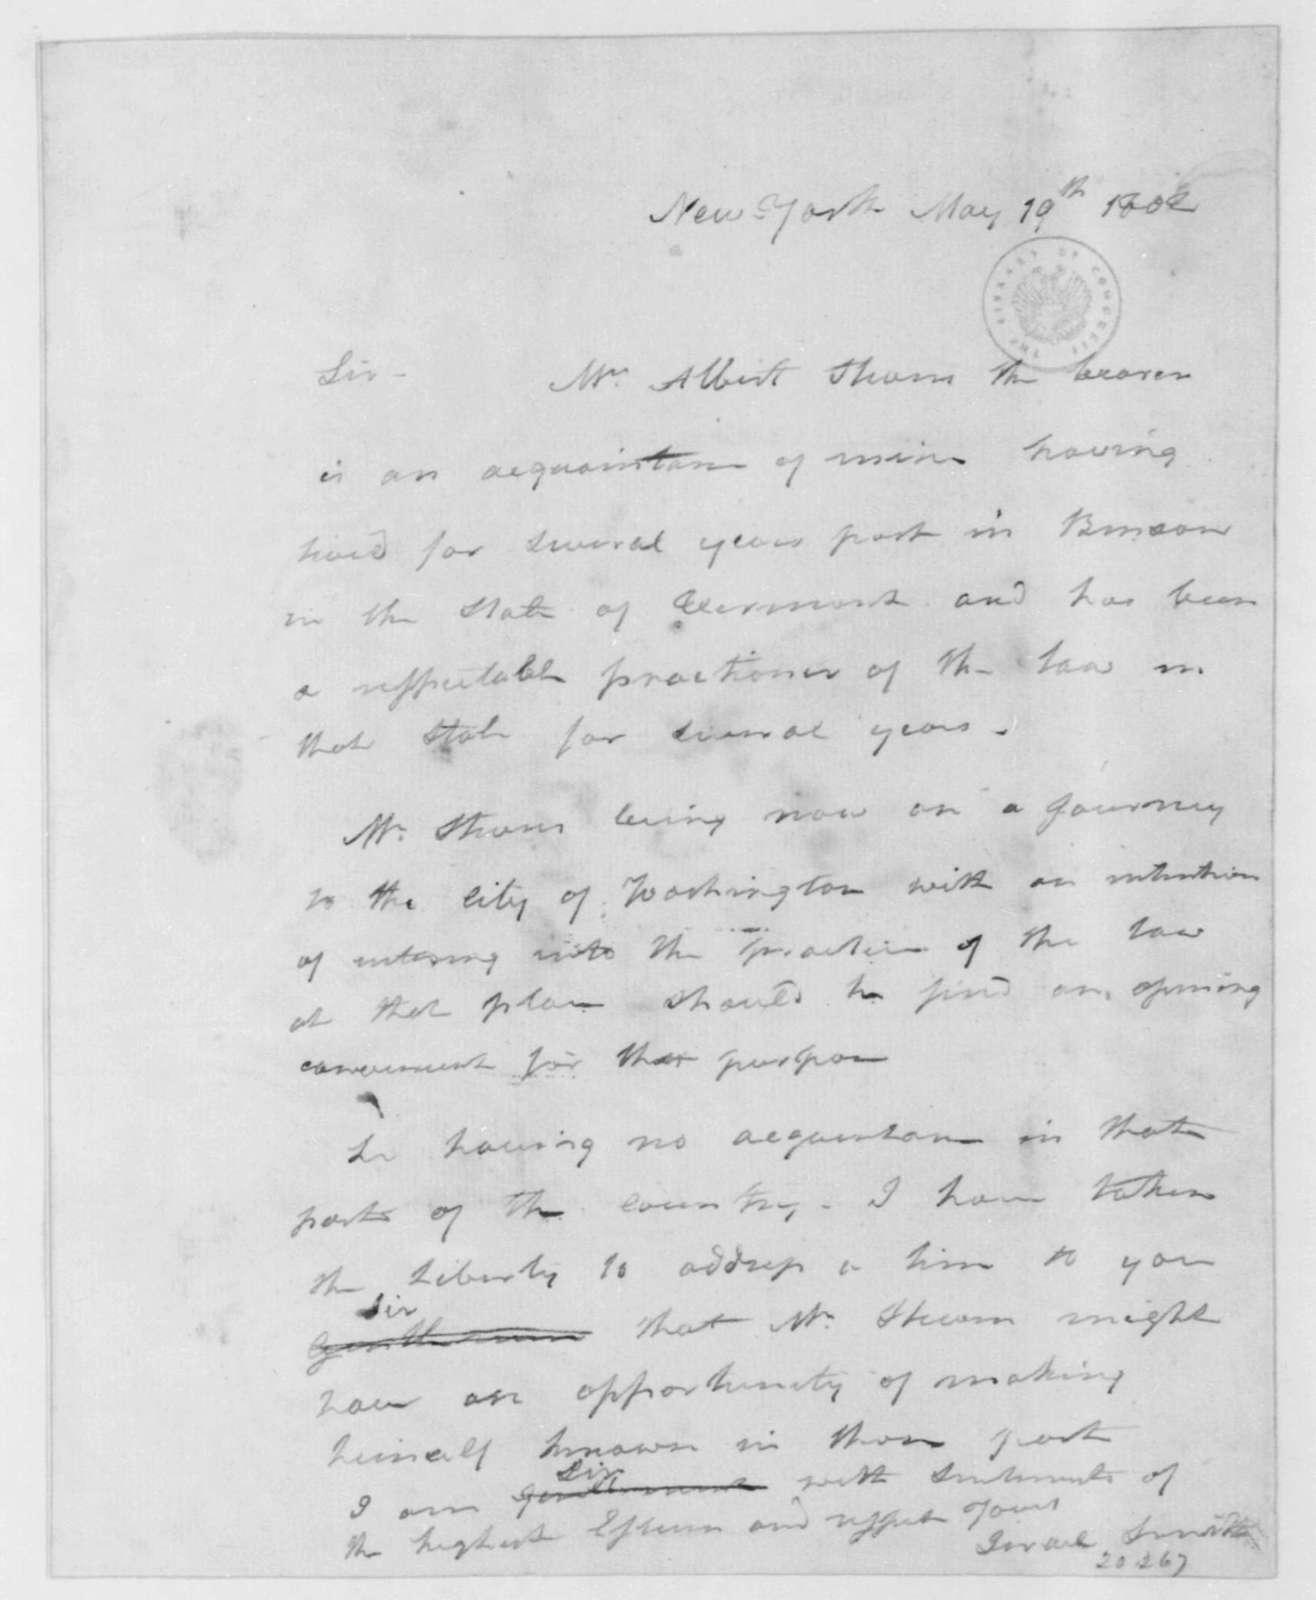 Israel Smith to James Madison, May 19, 1802.